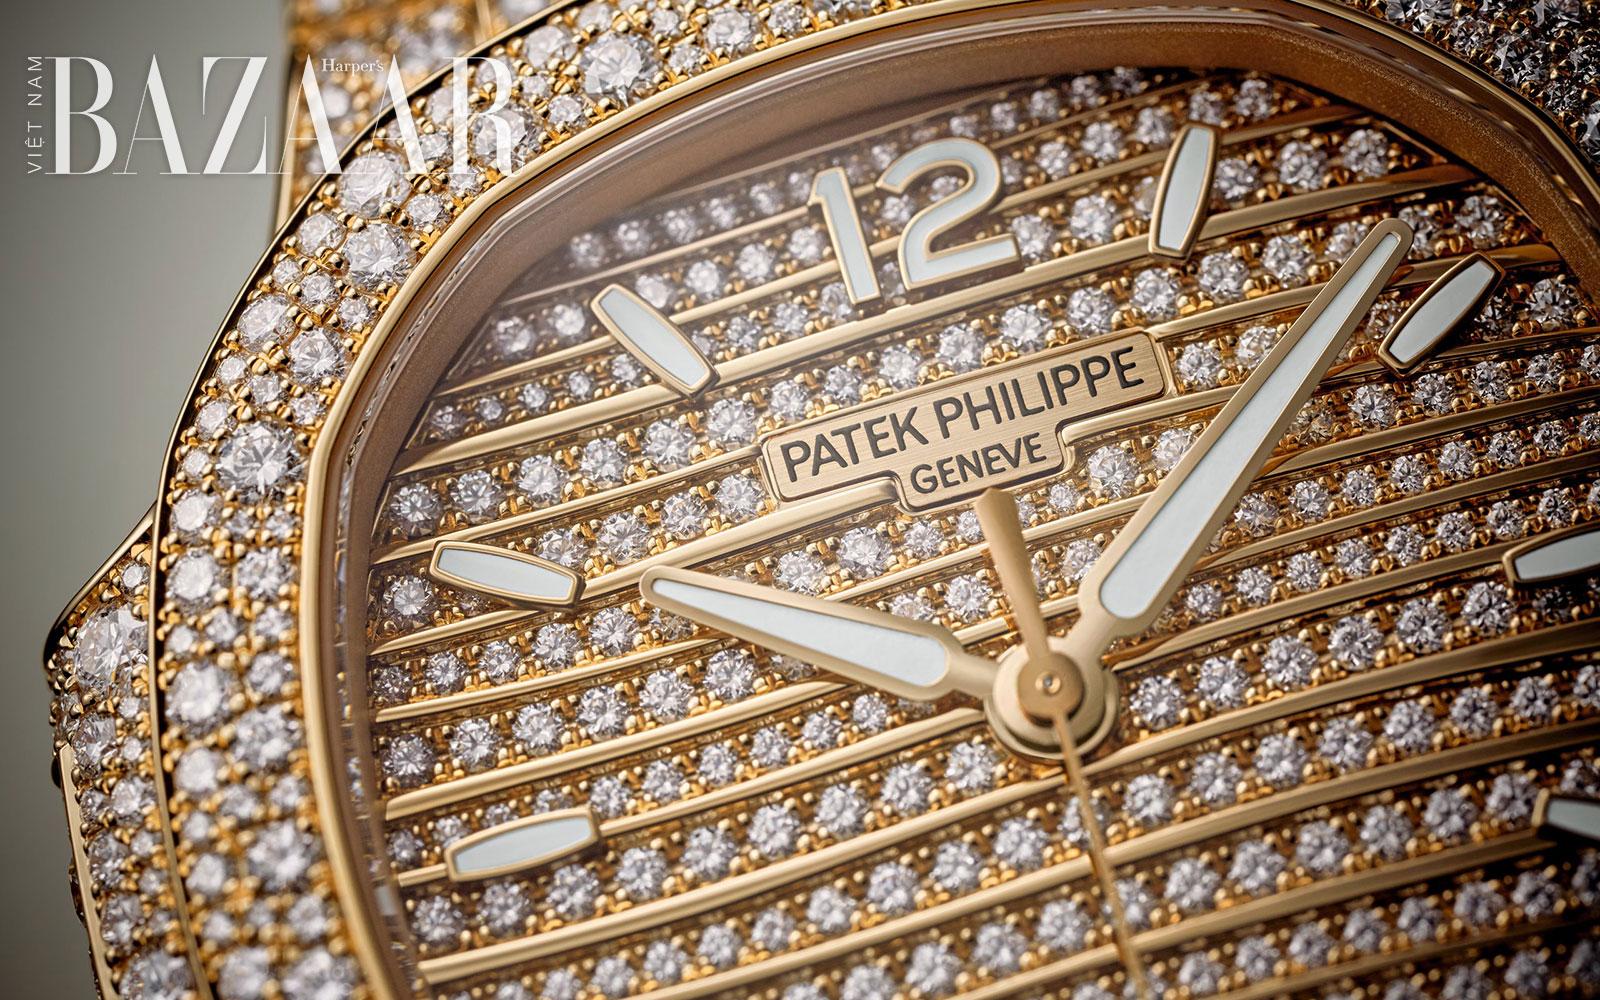 Patek Philippe ra mắt 4 mẫu đồng hồ Nautilus cho 2021 10